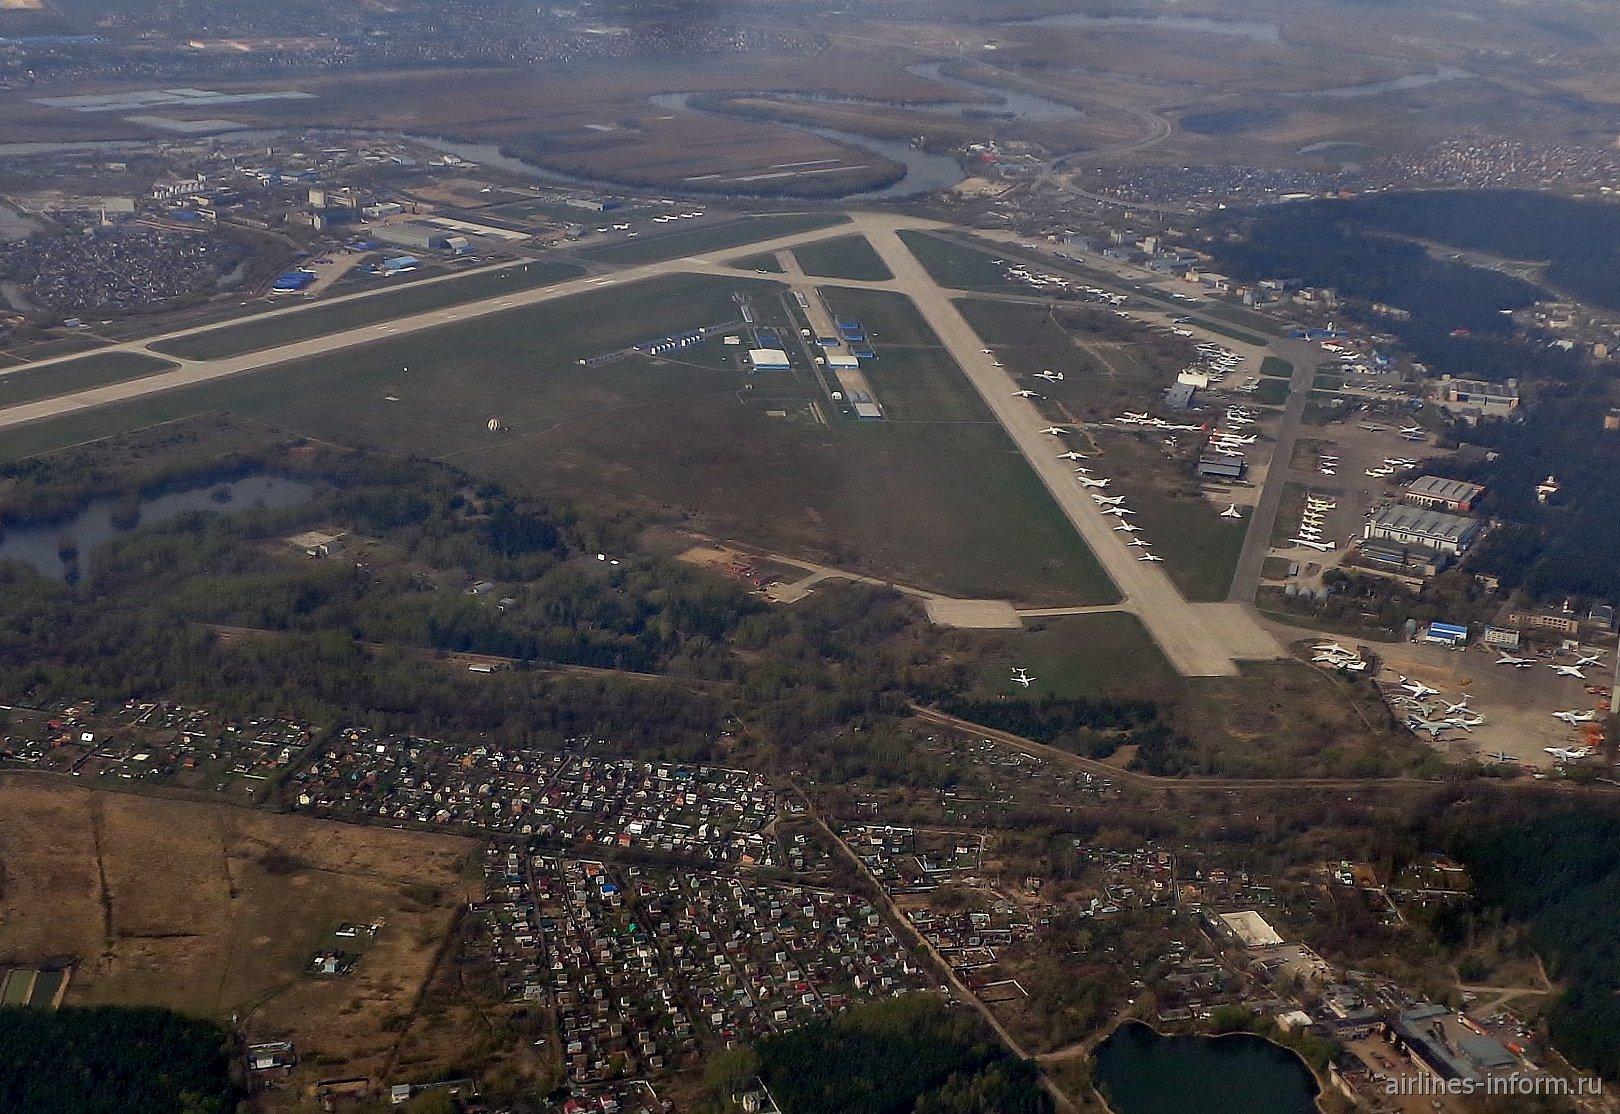 Территория ЛИИ имени Громова и аэродром Жуковский